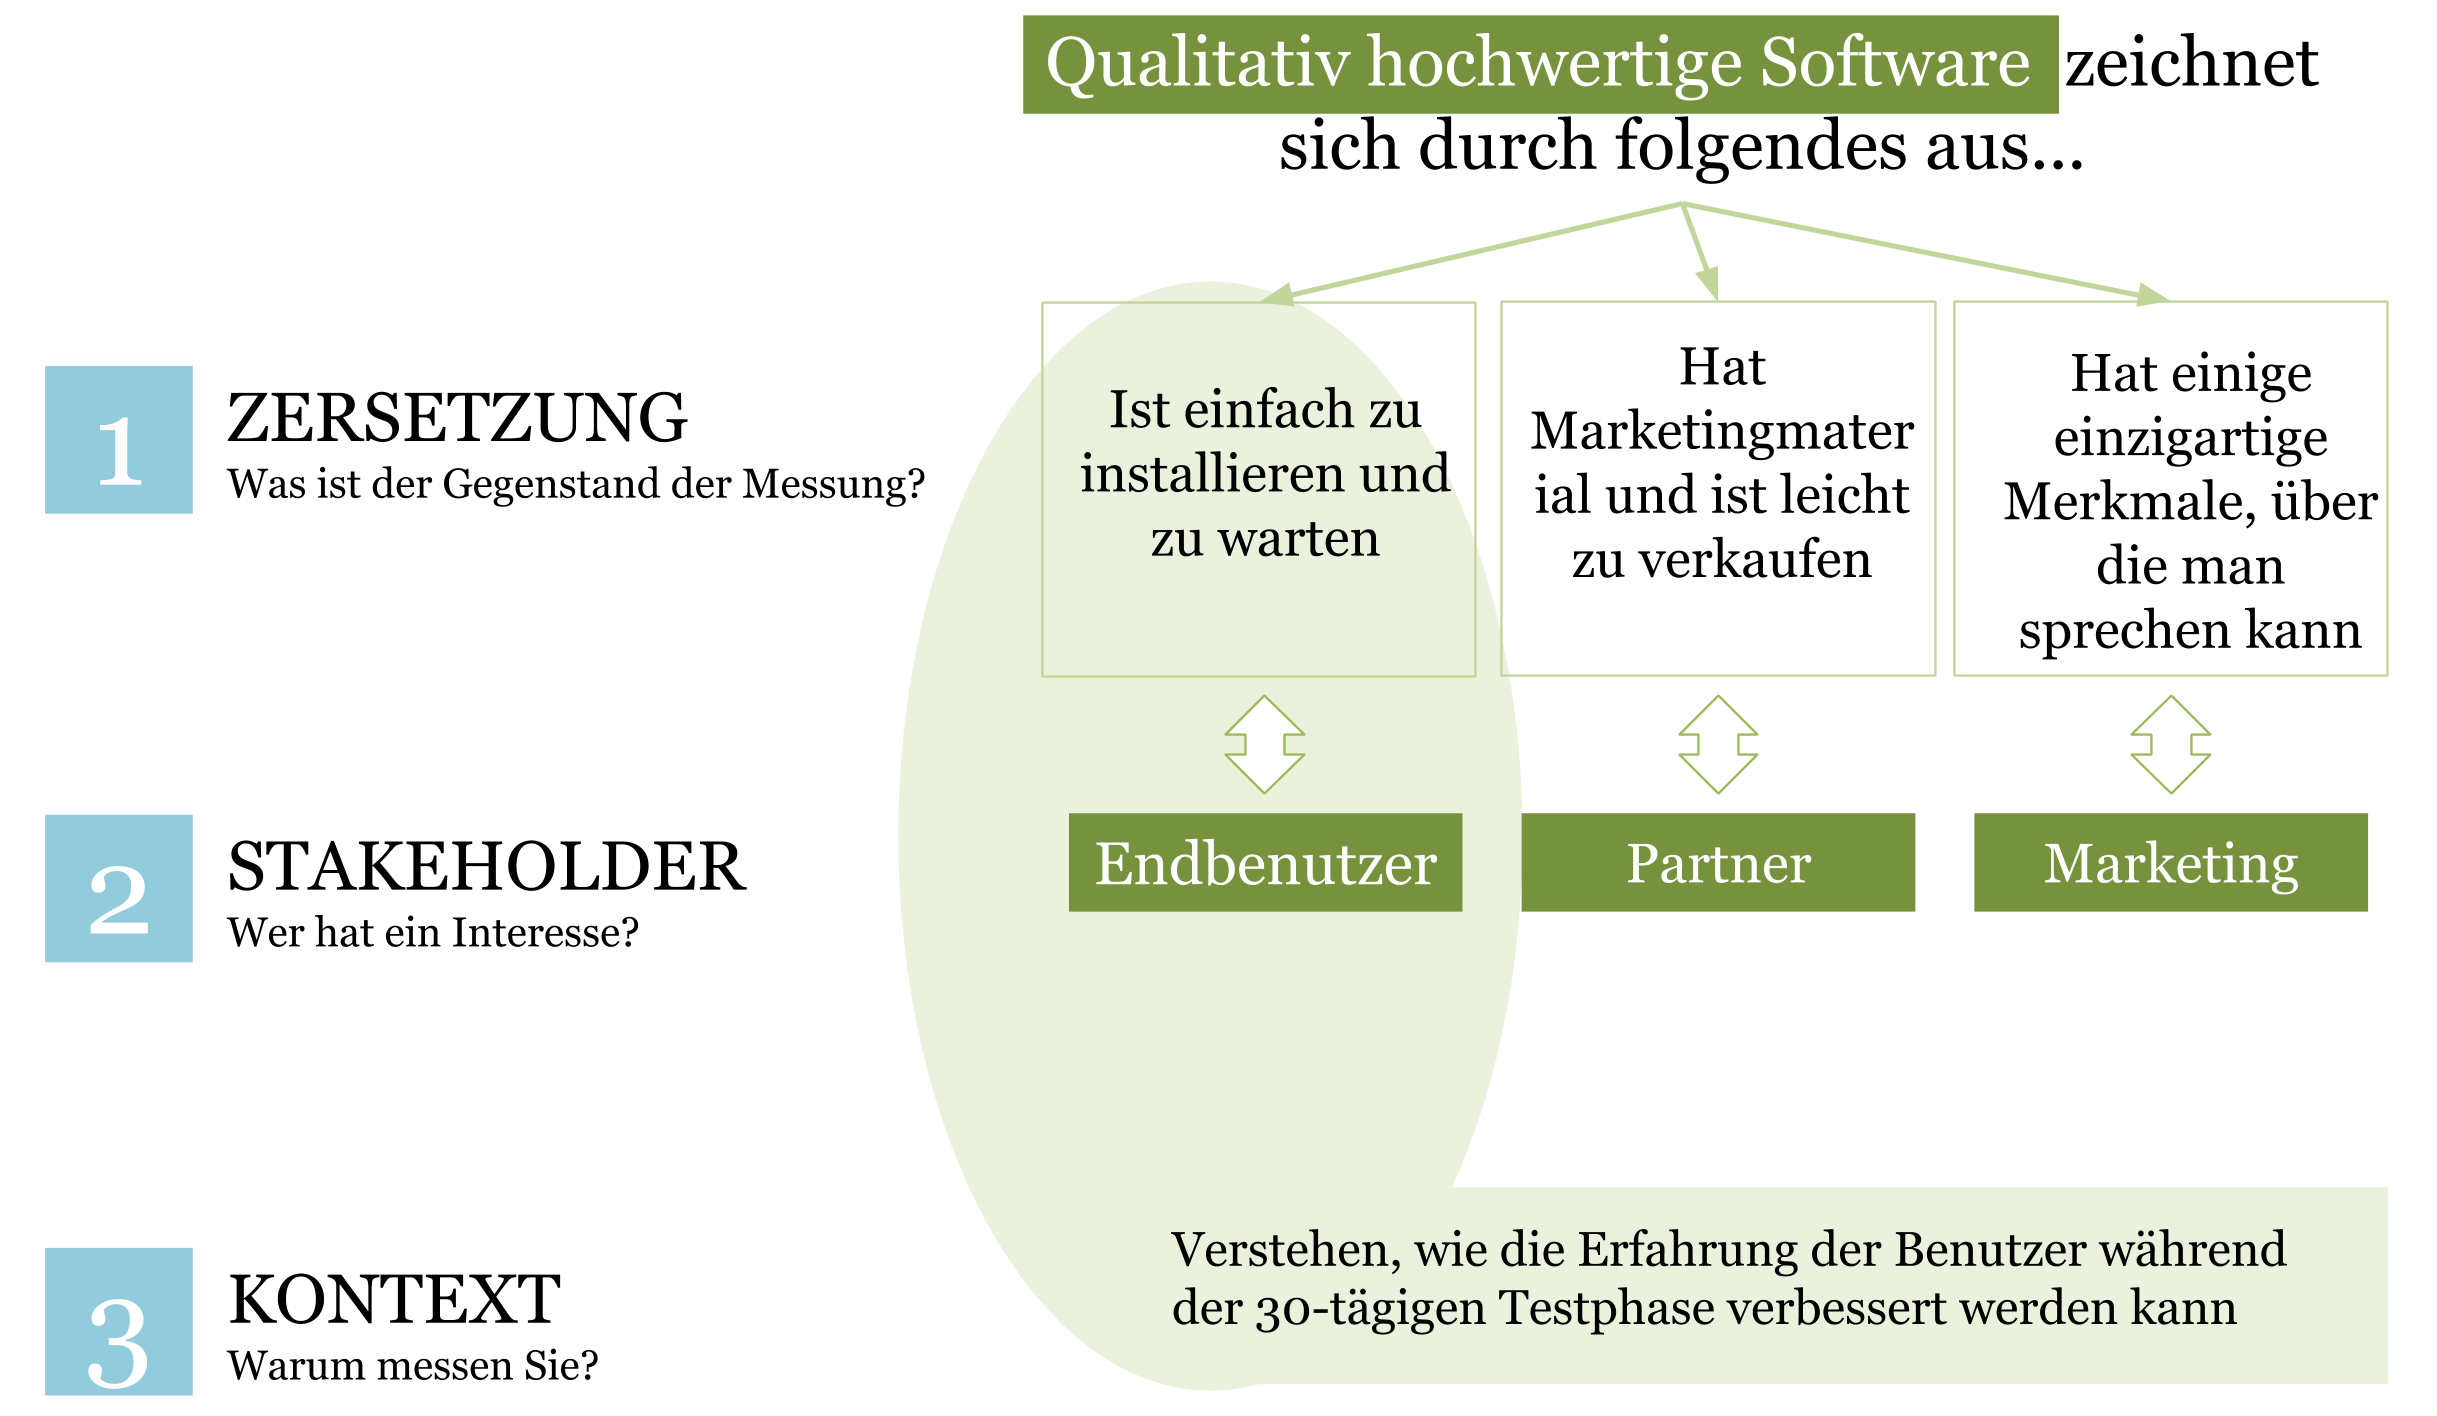 3 Schritte: Zerlegung, Stakeholder, Kontext